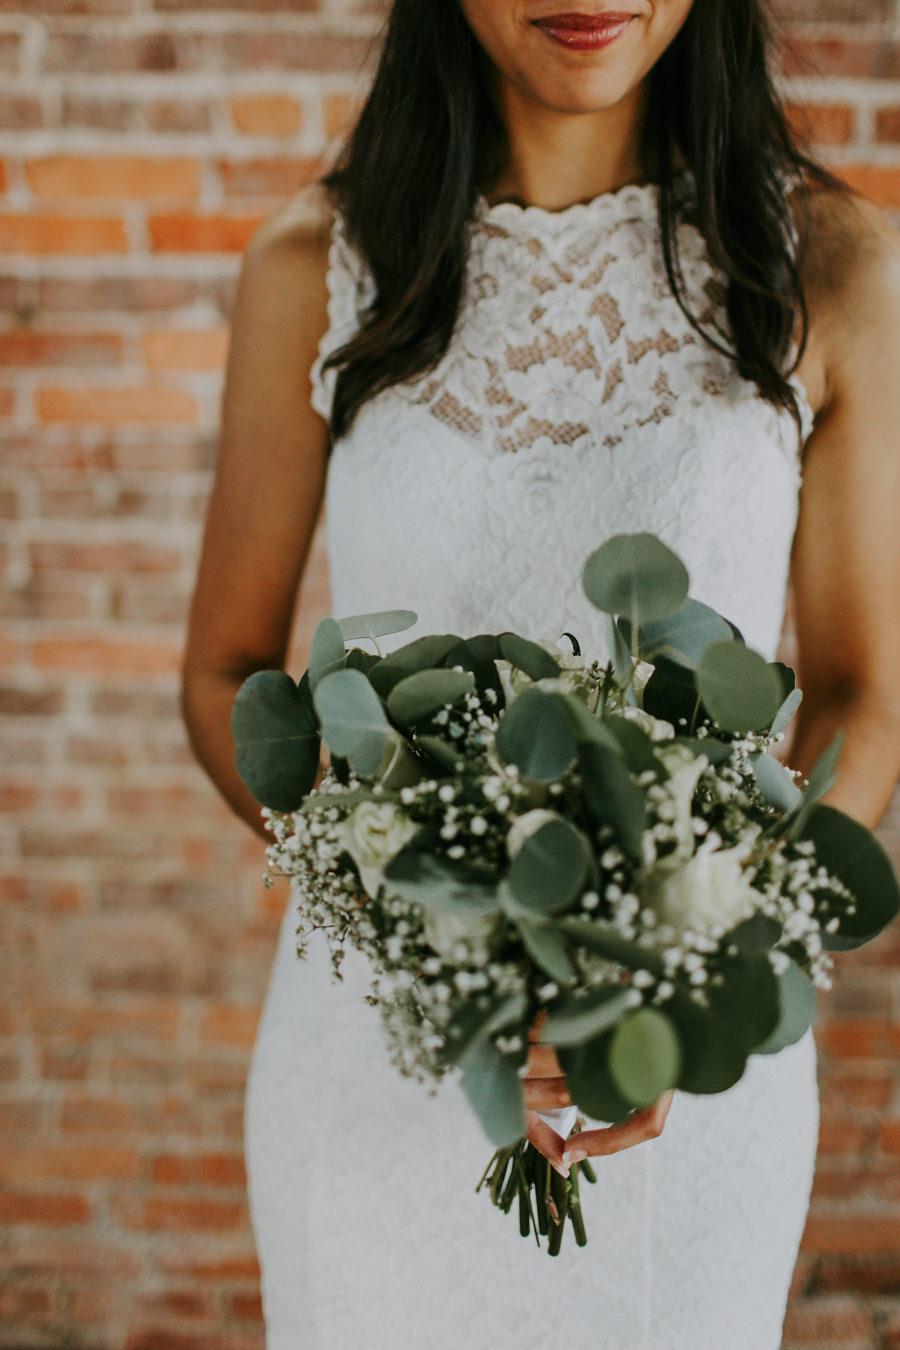 Tampa Heights Industrial Wedding at Cavu Emmy RJ-32.jpg